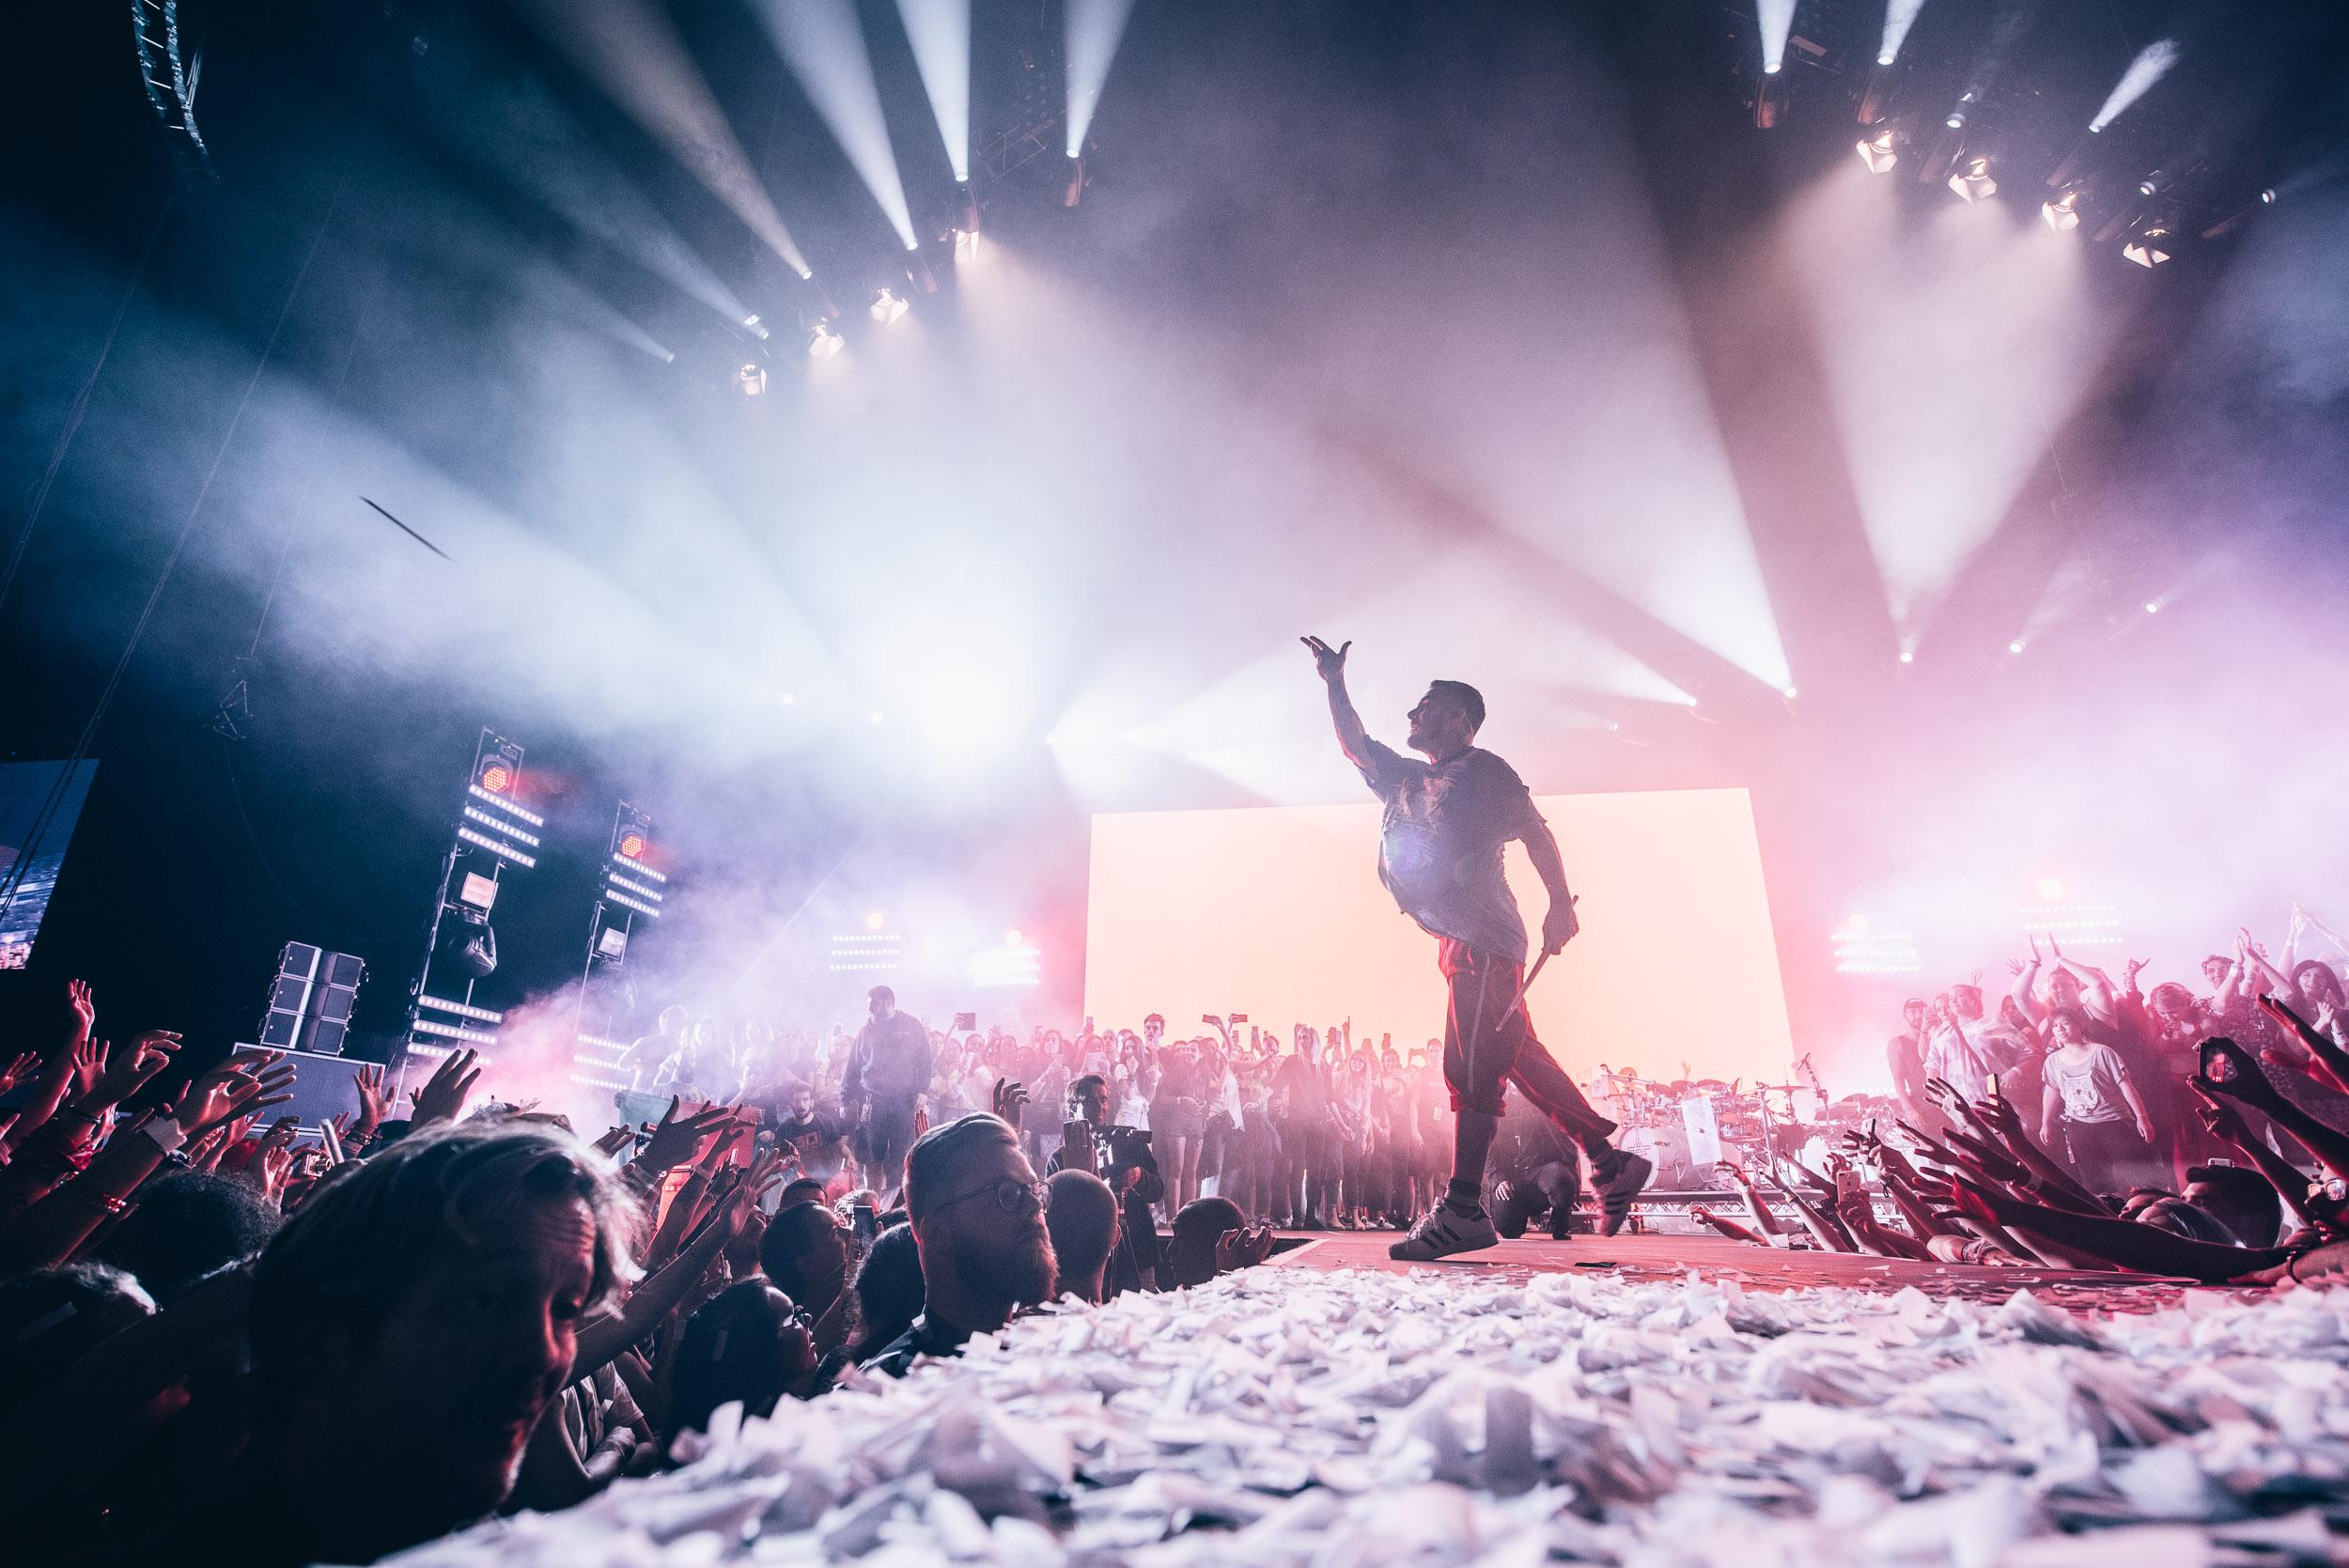 30 Seconds to Mars Altice Arena 20180912-1374.jpg